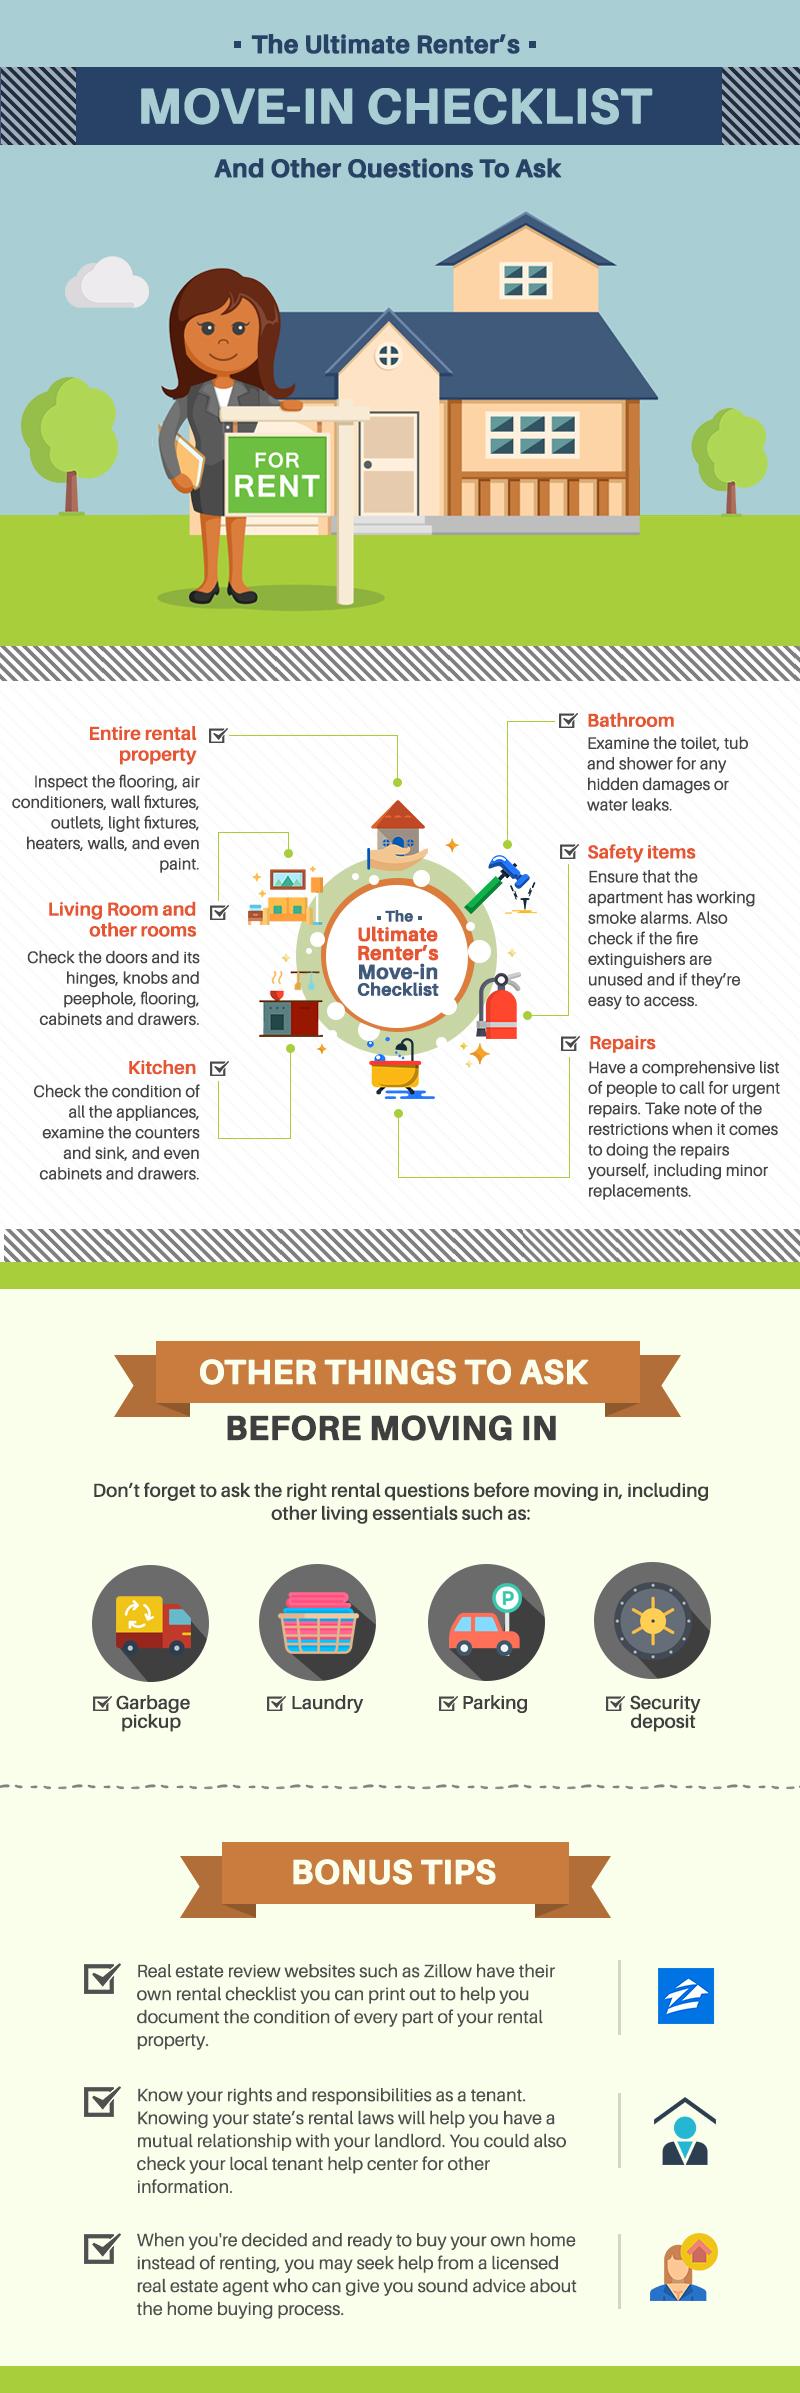 The Ultimate Renter's Move-In Checklist (1).jpg